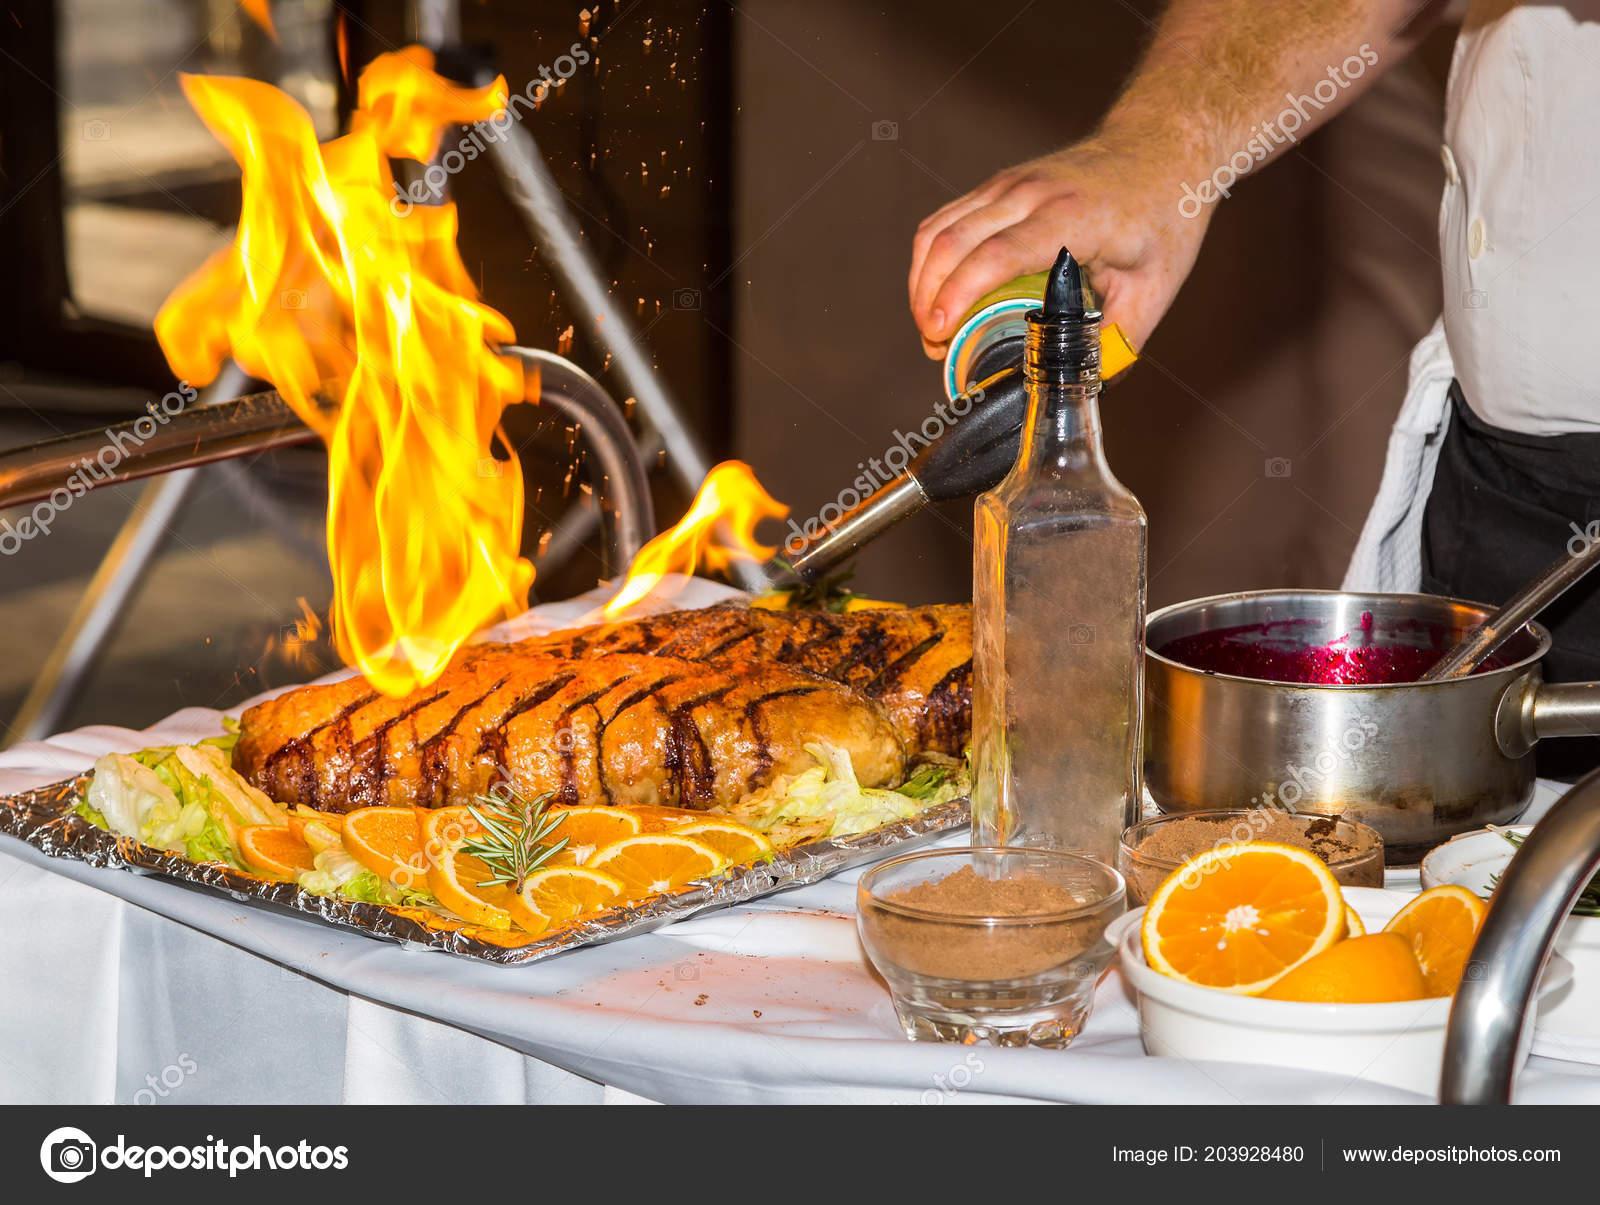 Professional Chef Prepares Meat Dish Mini Torch Open Flame ...